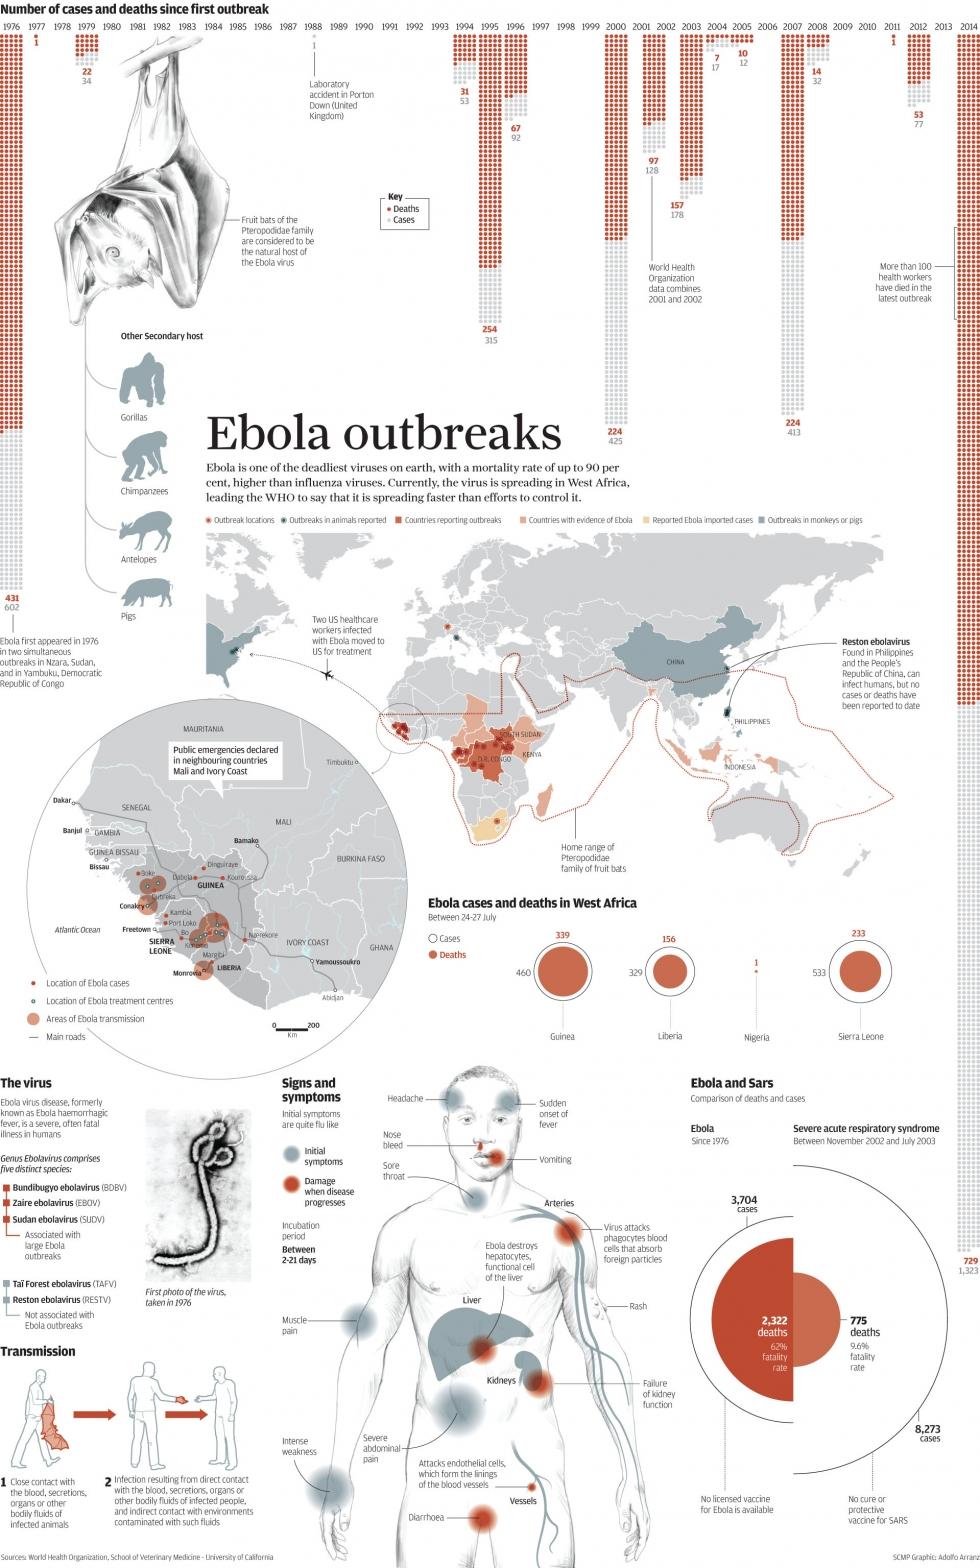 20140803_ebola_outbreaks